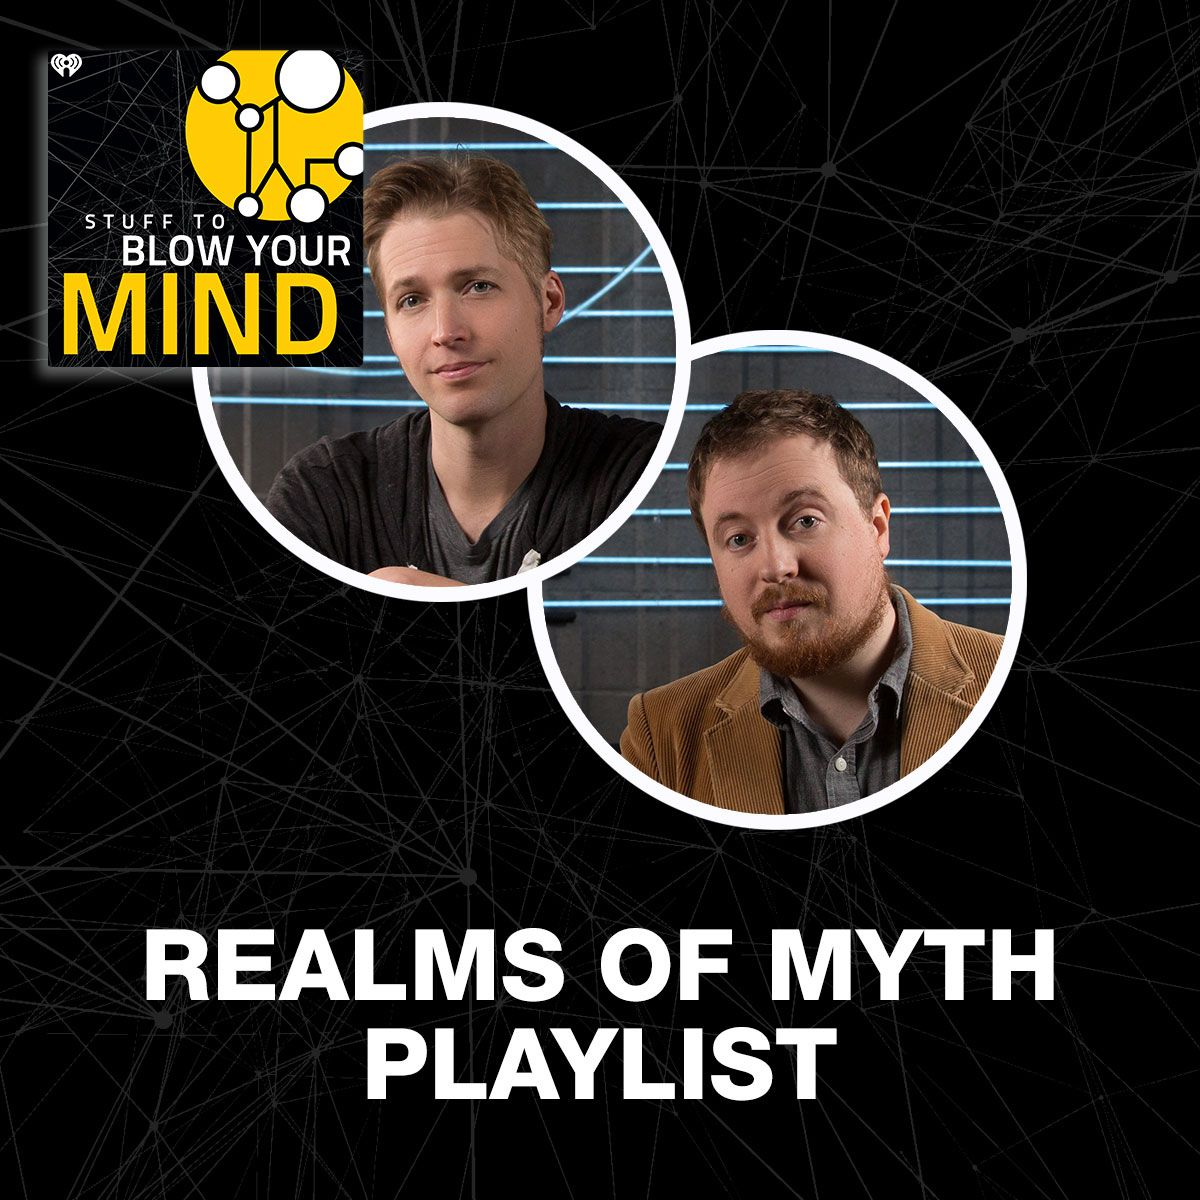 Realms of Myth Playlist, Part 2: The Myth-Fleshed Fossil